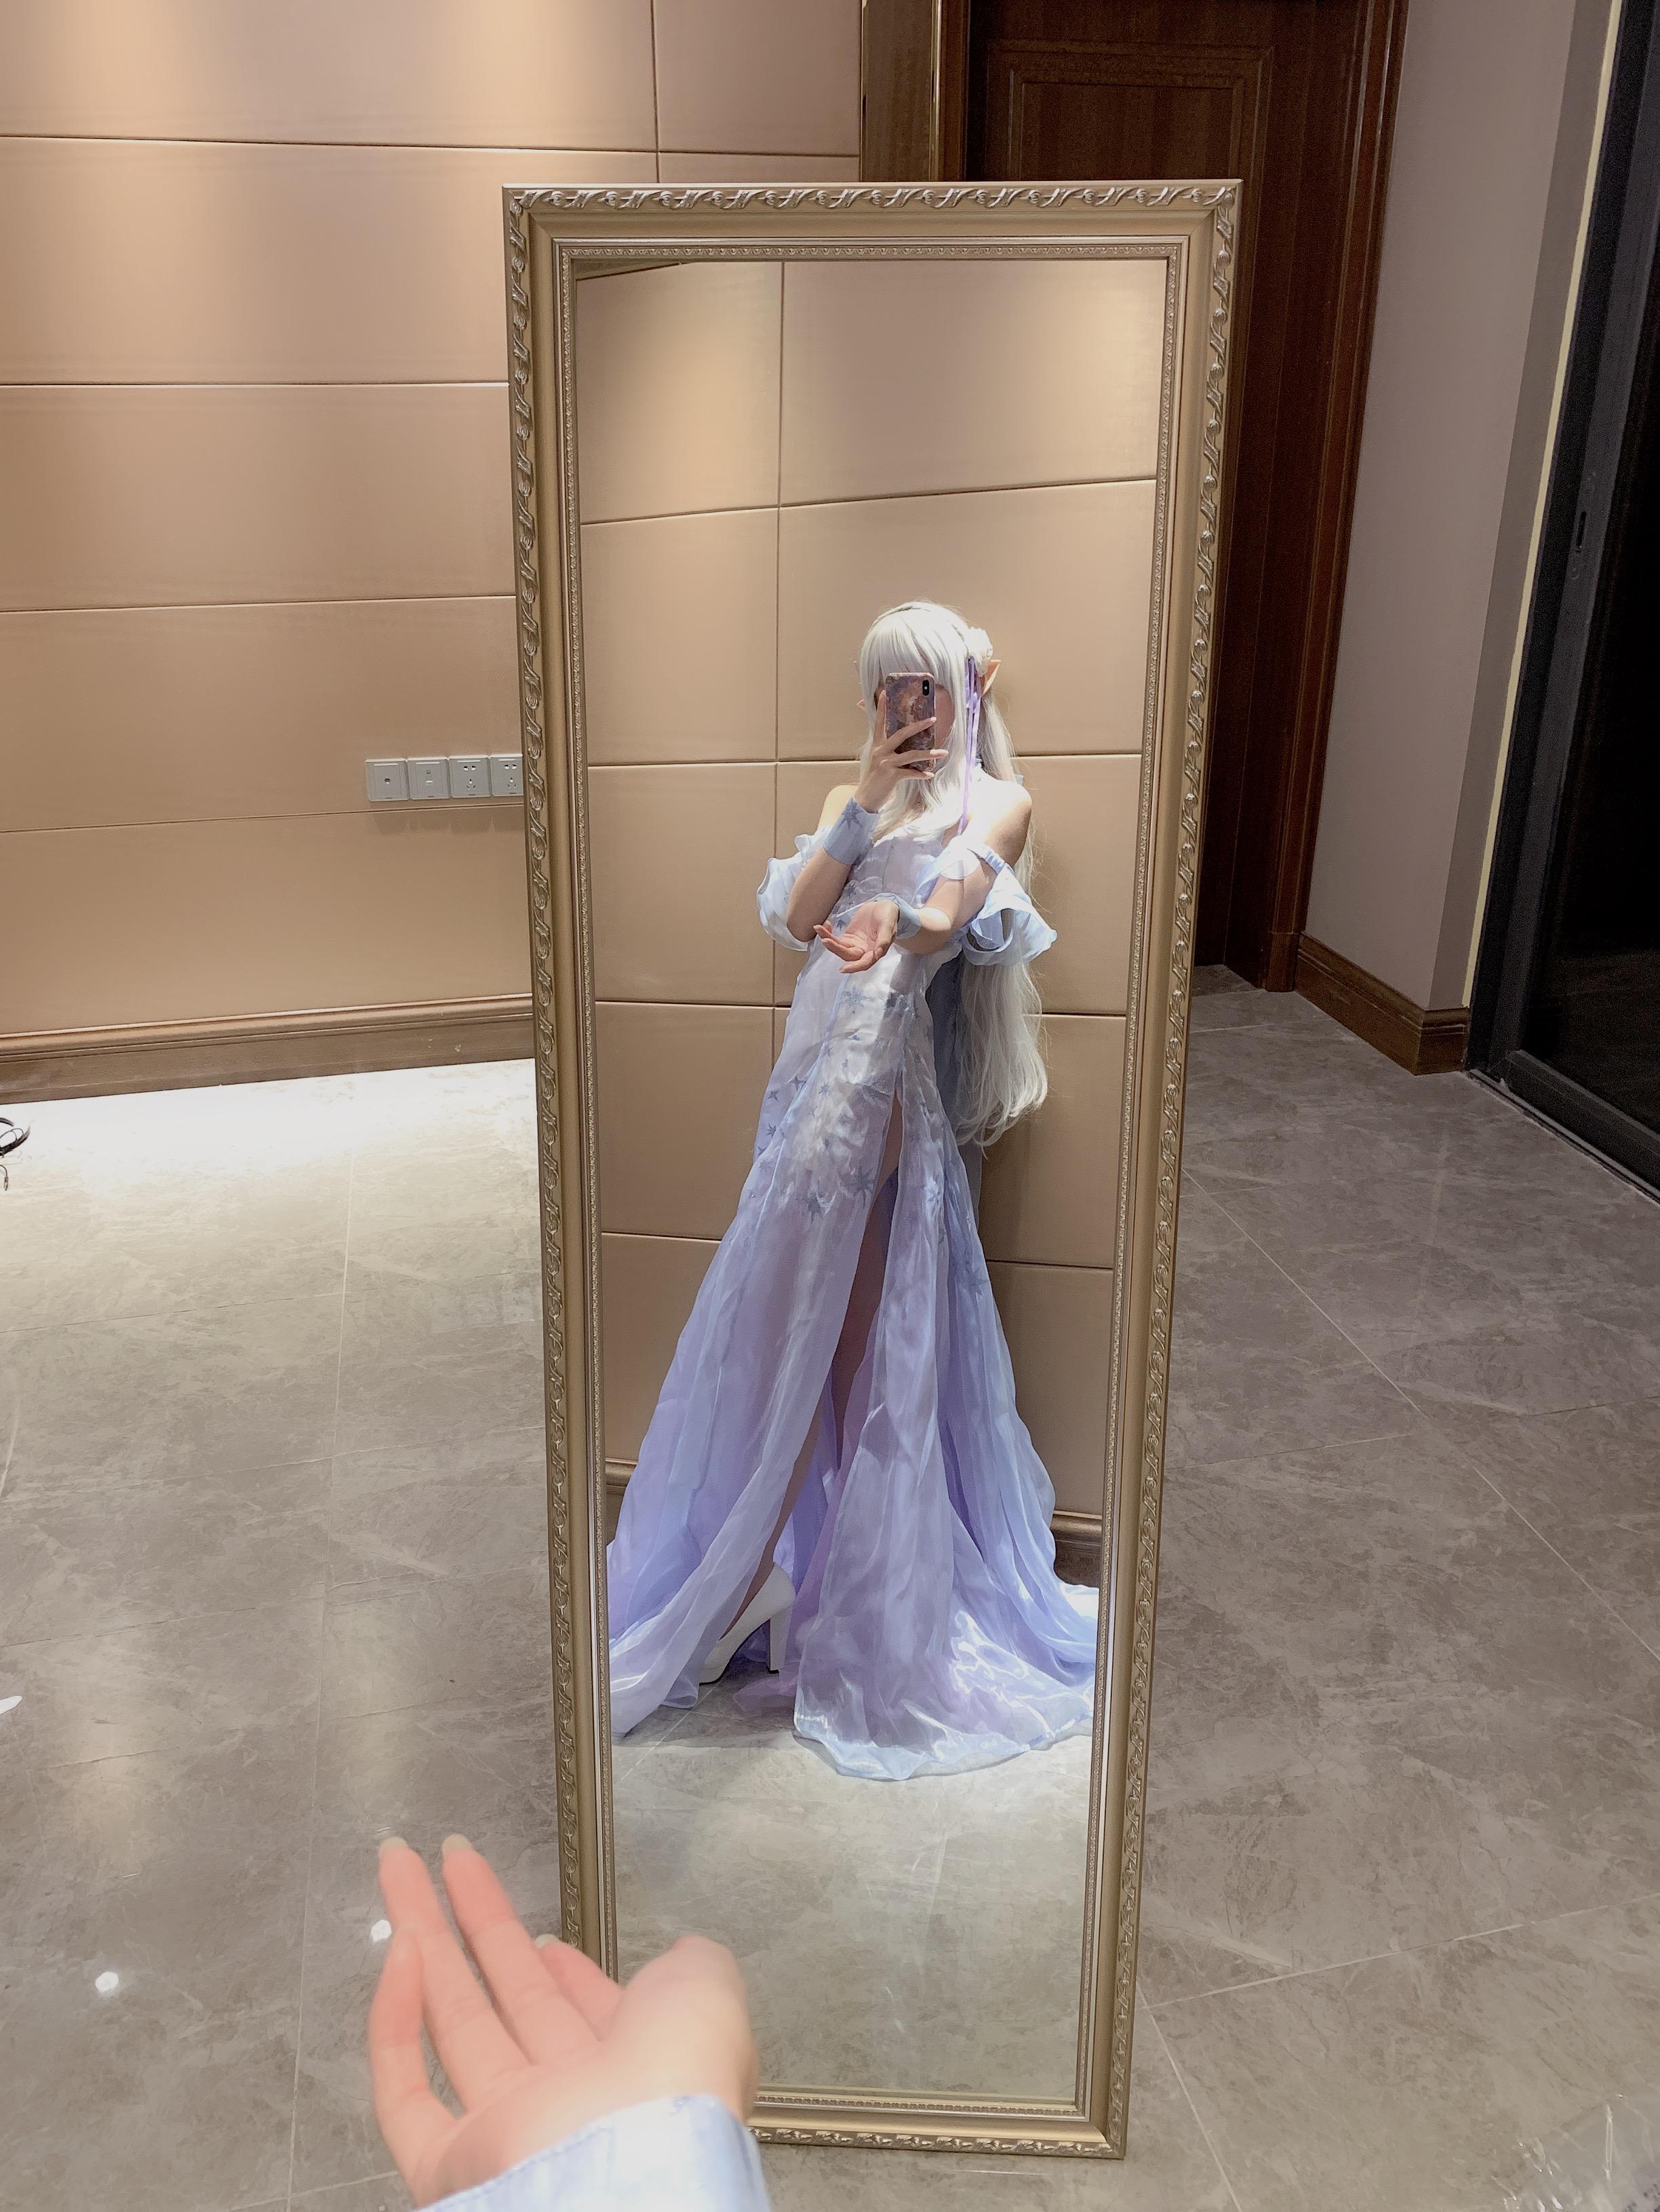 《RE:从零开始的异世界生活》艾米莉亚cosplay【CN:Rin__】-第5张